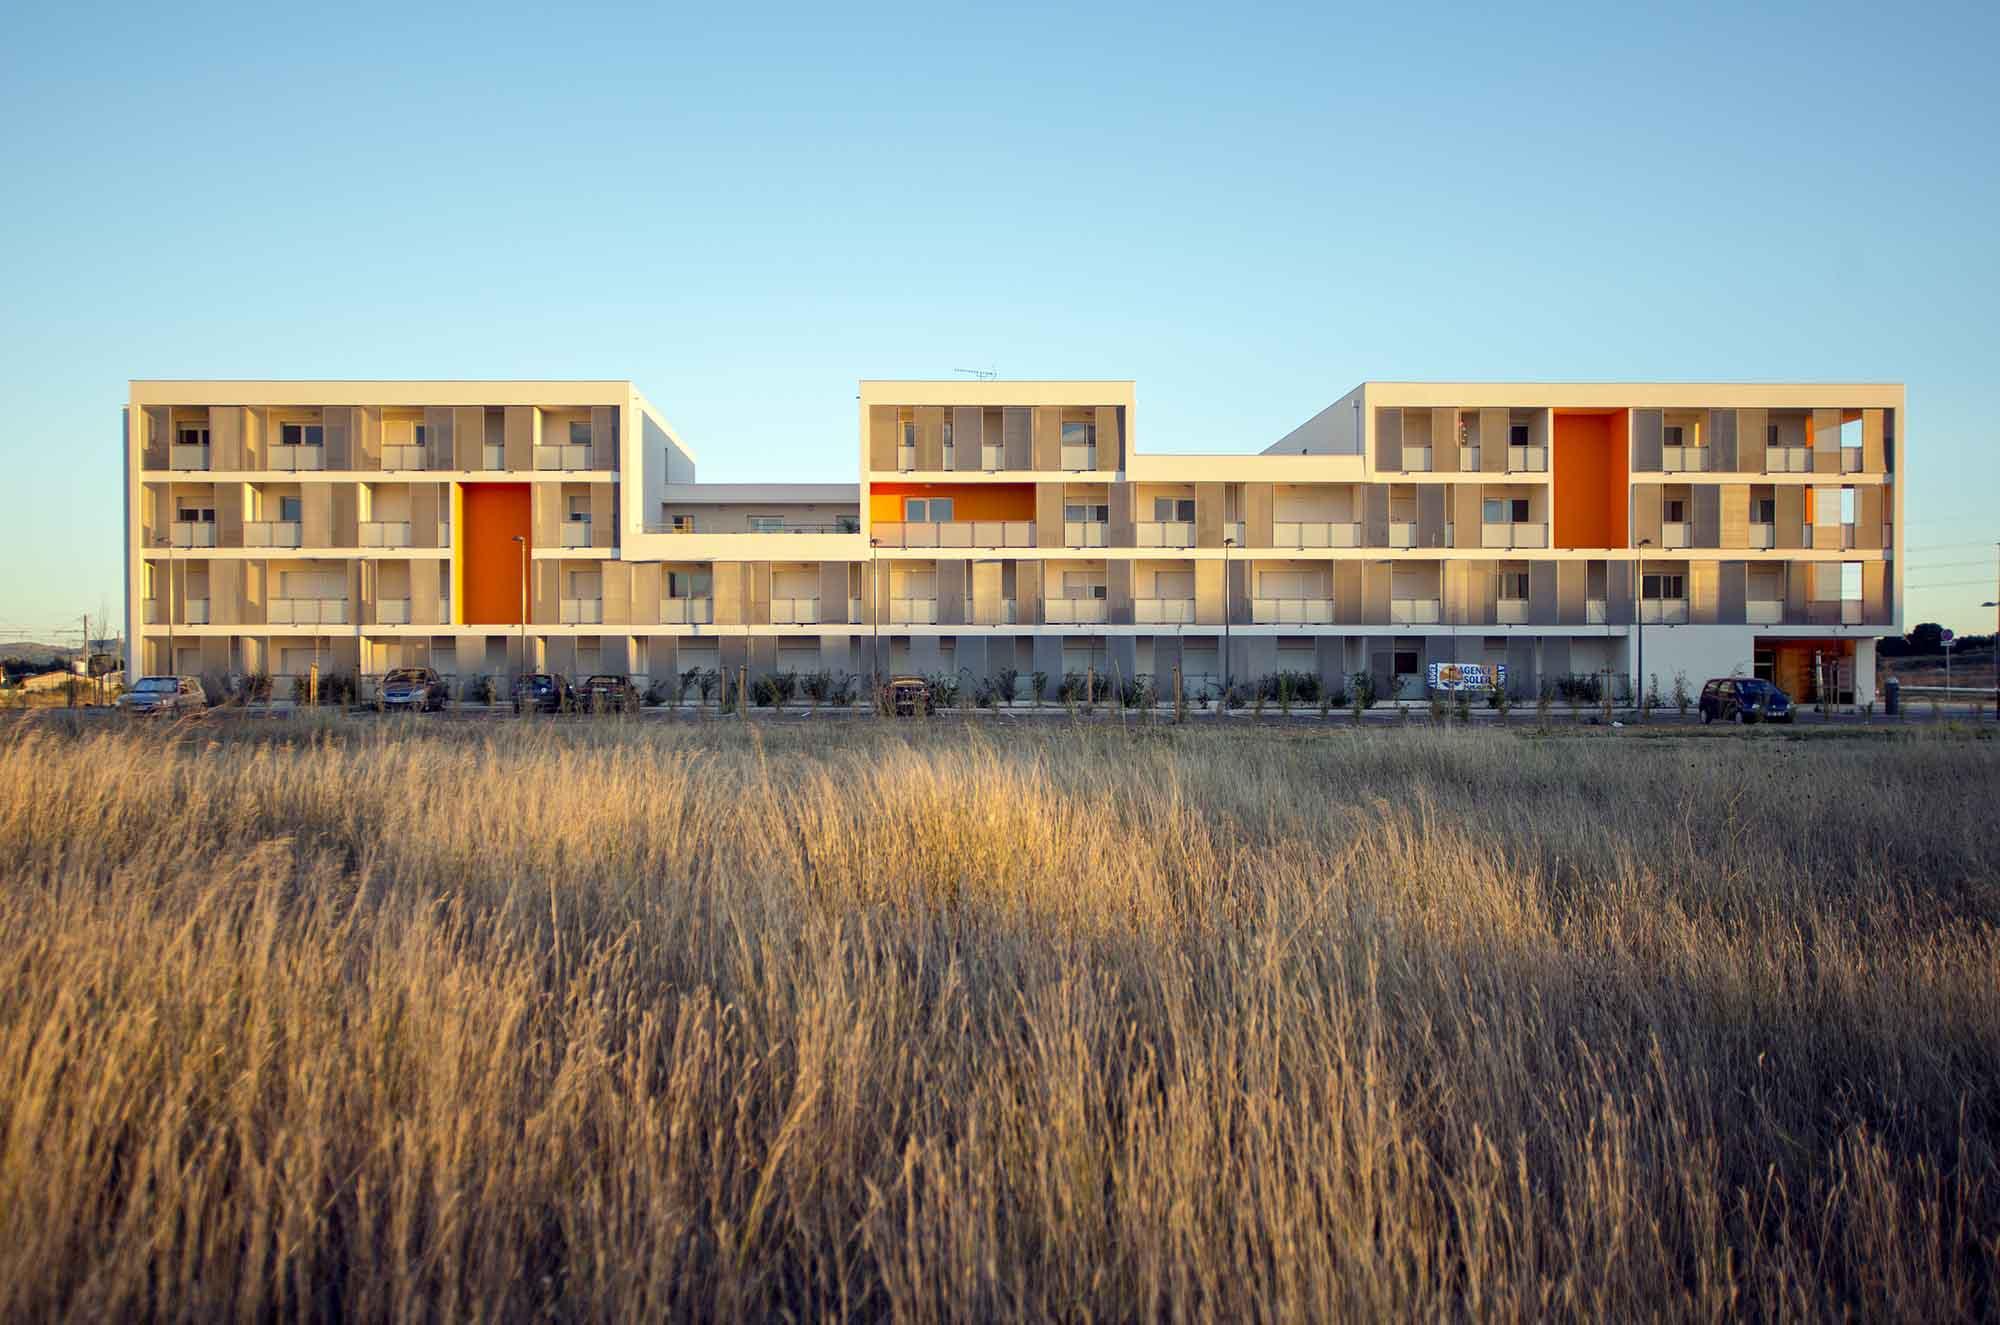 Photographe-architecture-Agence-Rayssac-projet-logement-collectif-sud-france-occitanie-aude